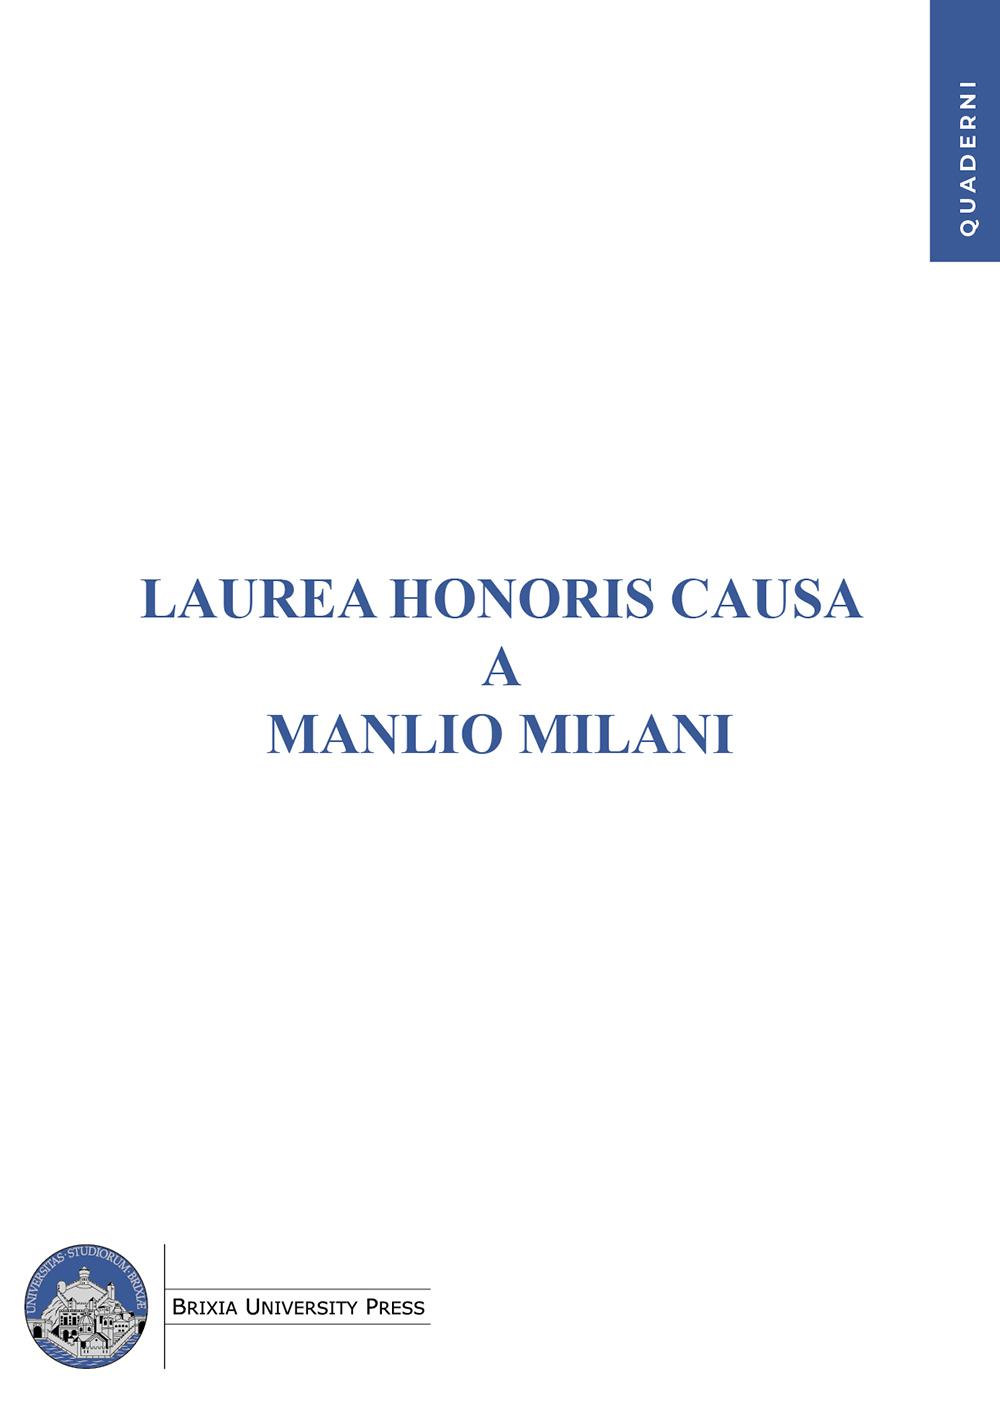 Laurea Honoris Causa a Manlio Milani - Bononia University Press